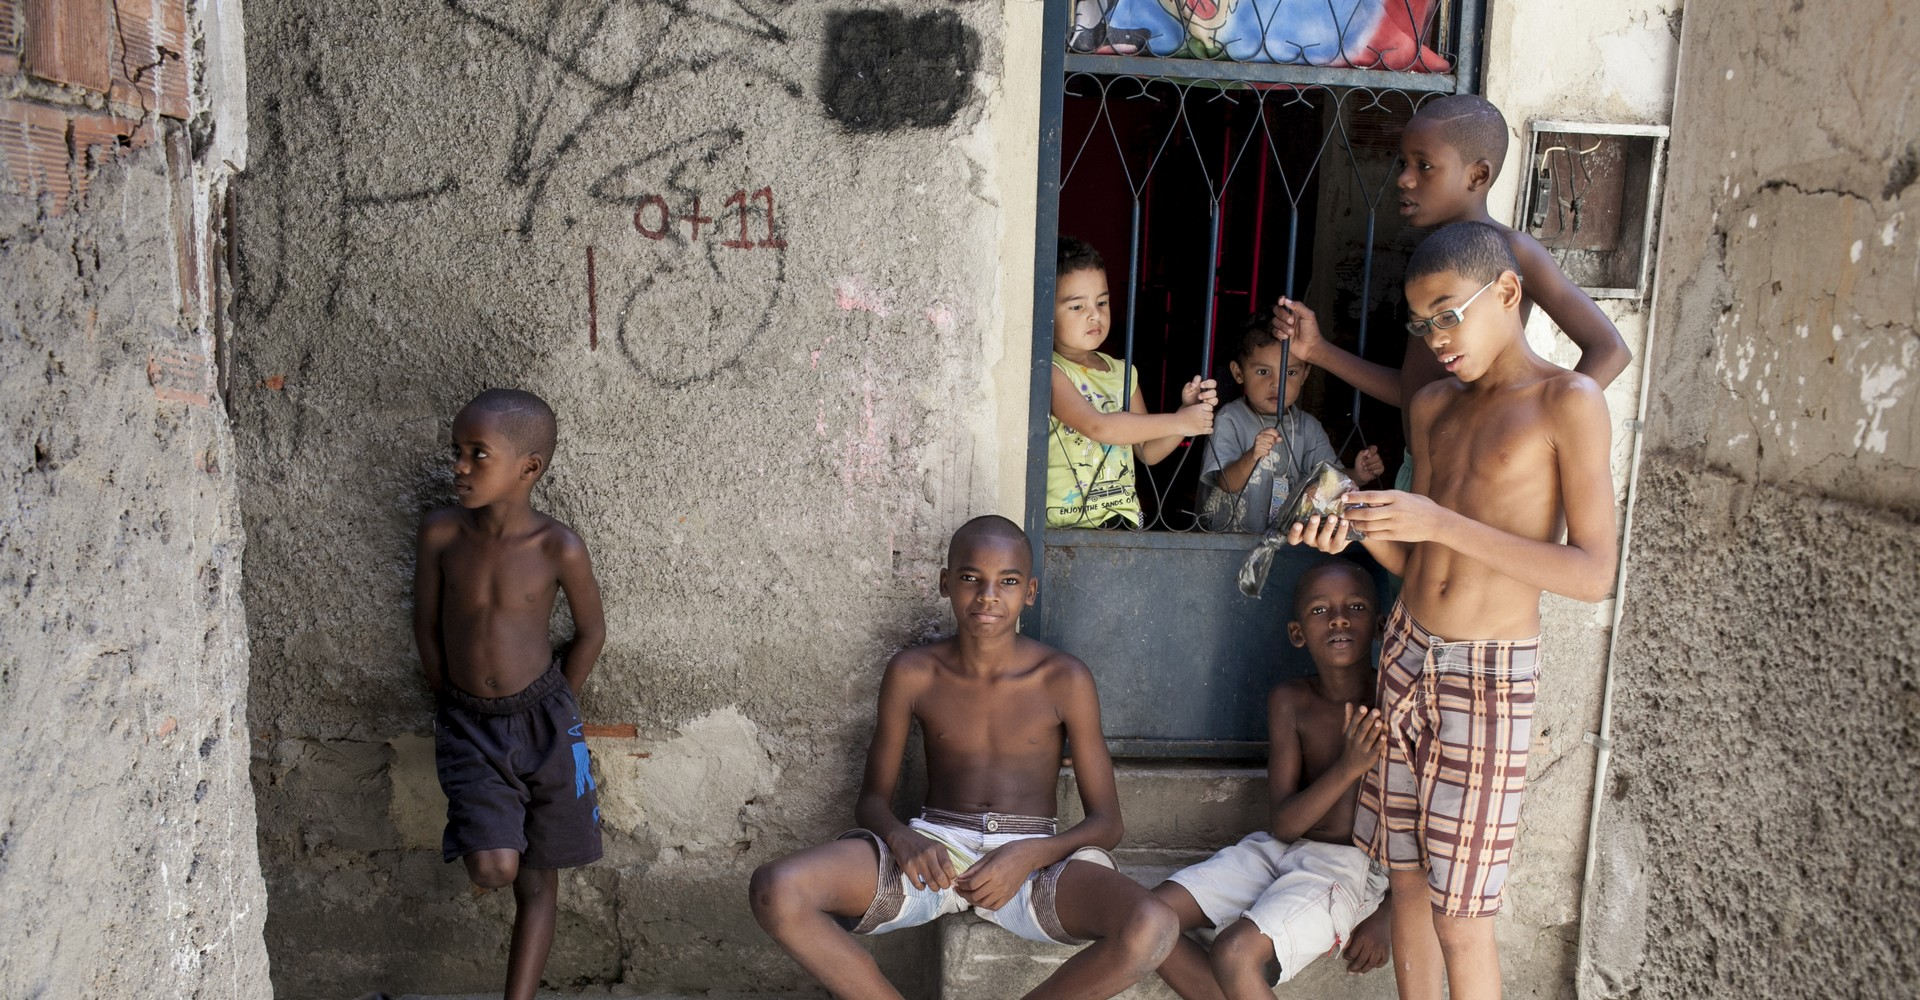 brasile povertà, aiutare i bambini